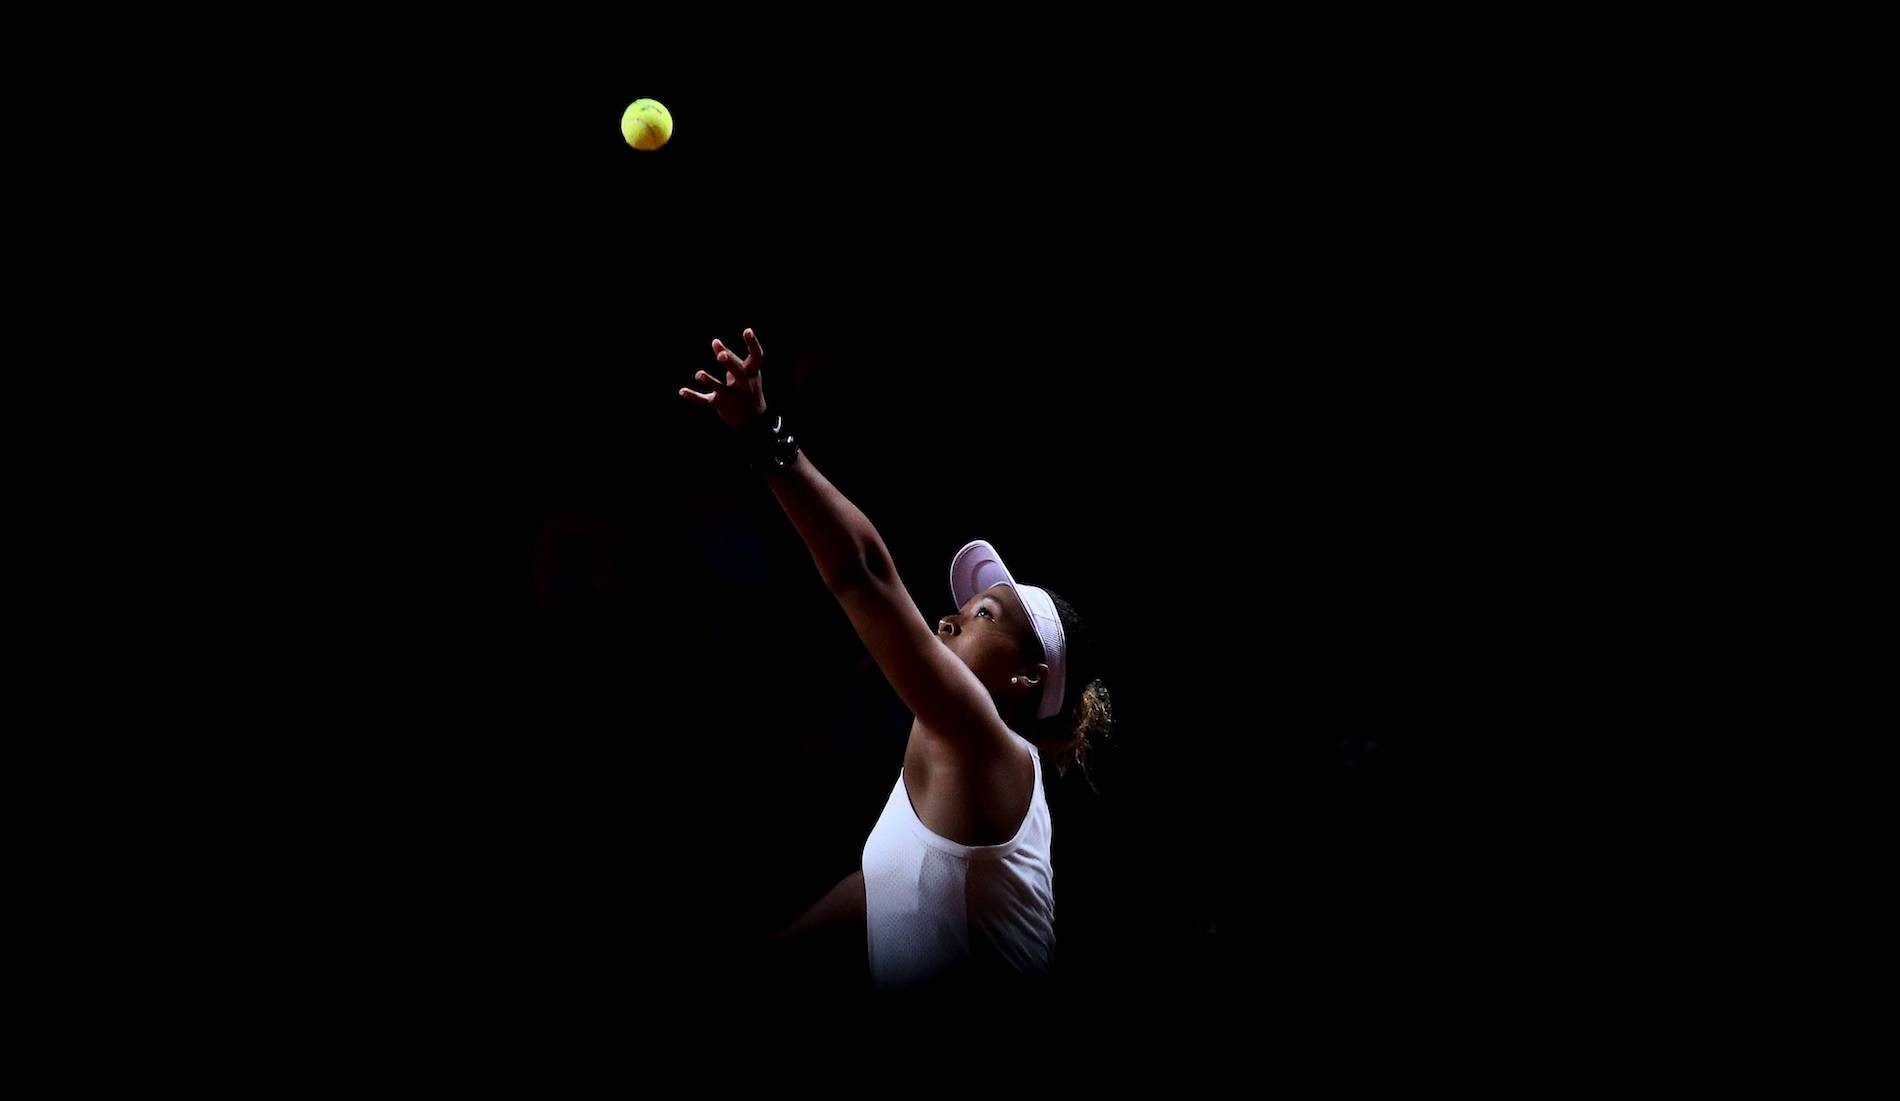 Naomi Osaka au service, en 2019 sur le WTA Tour